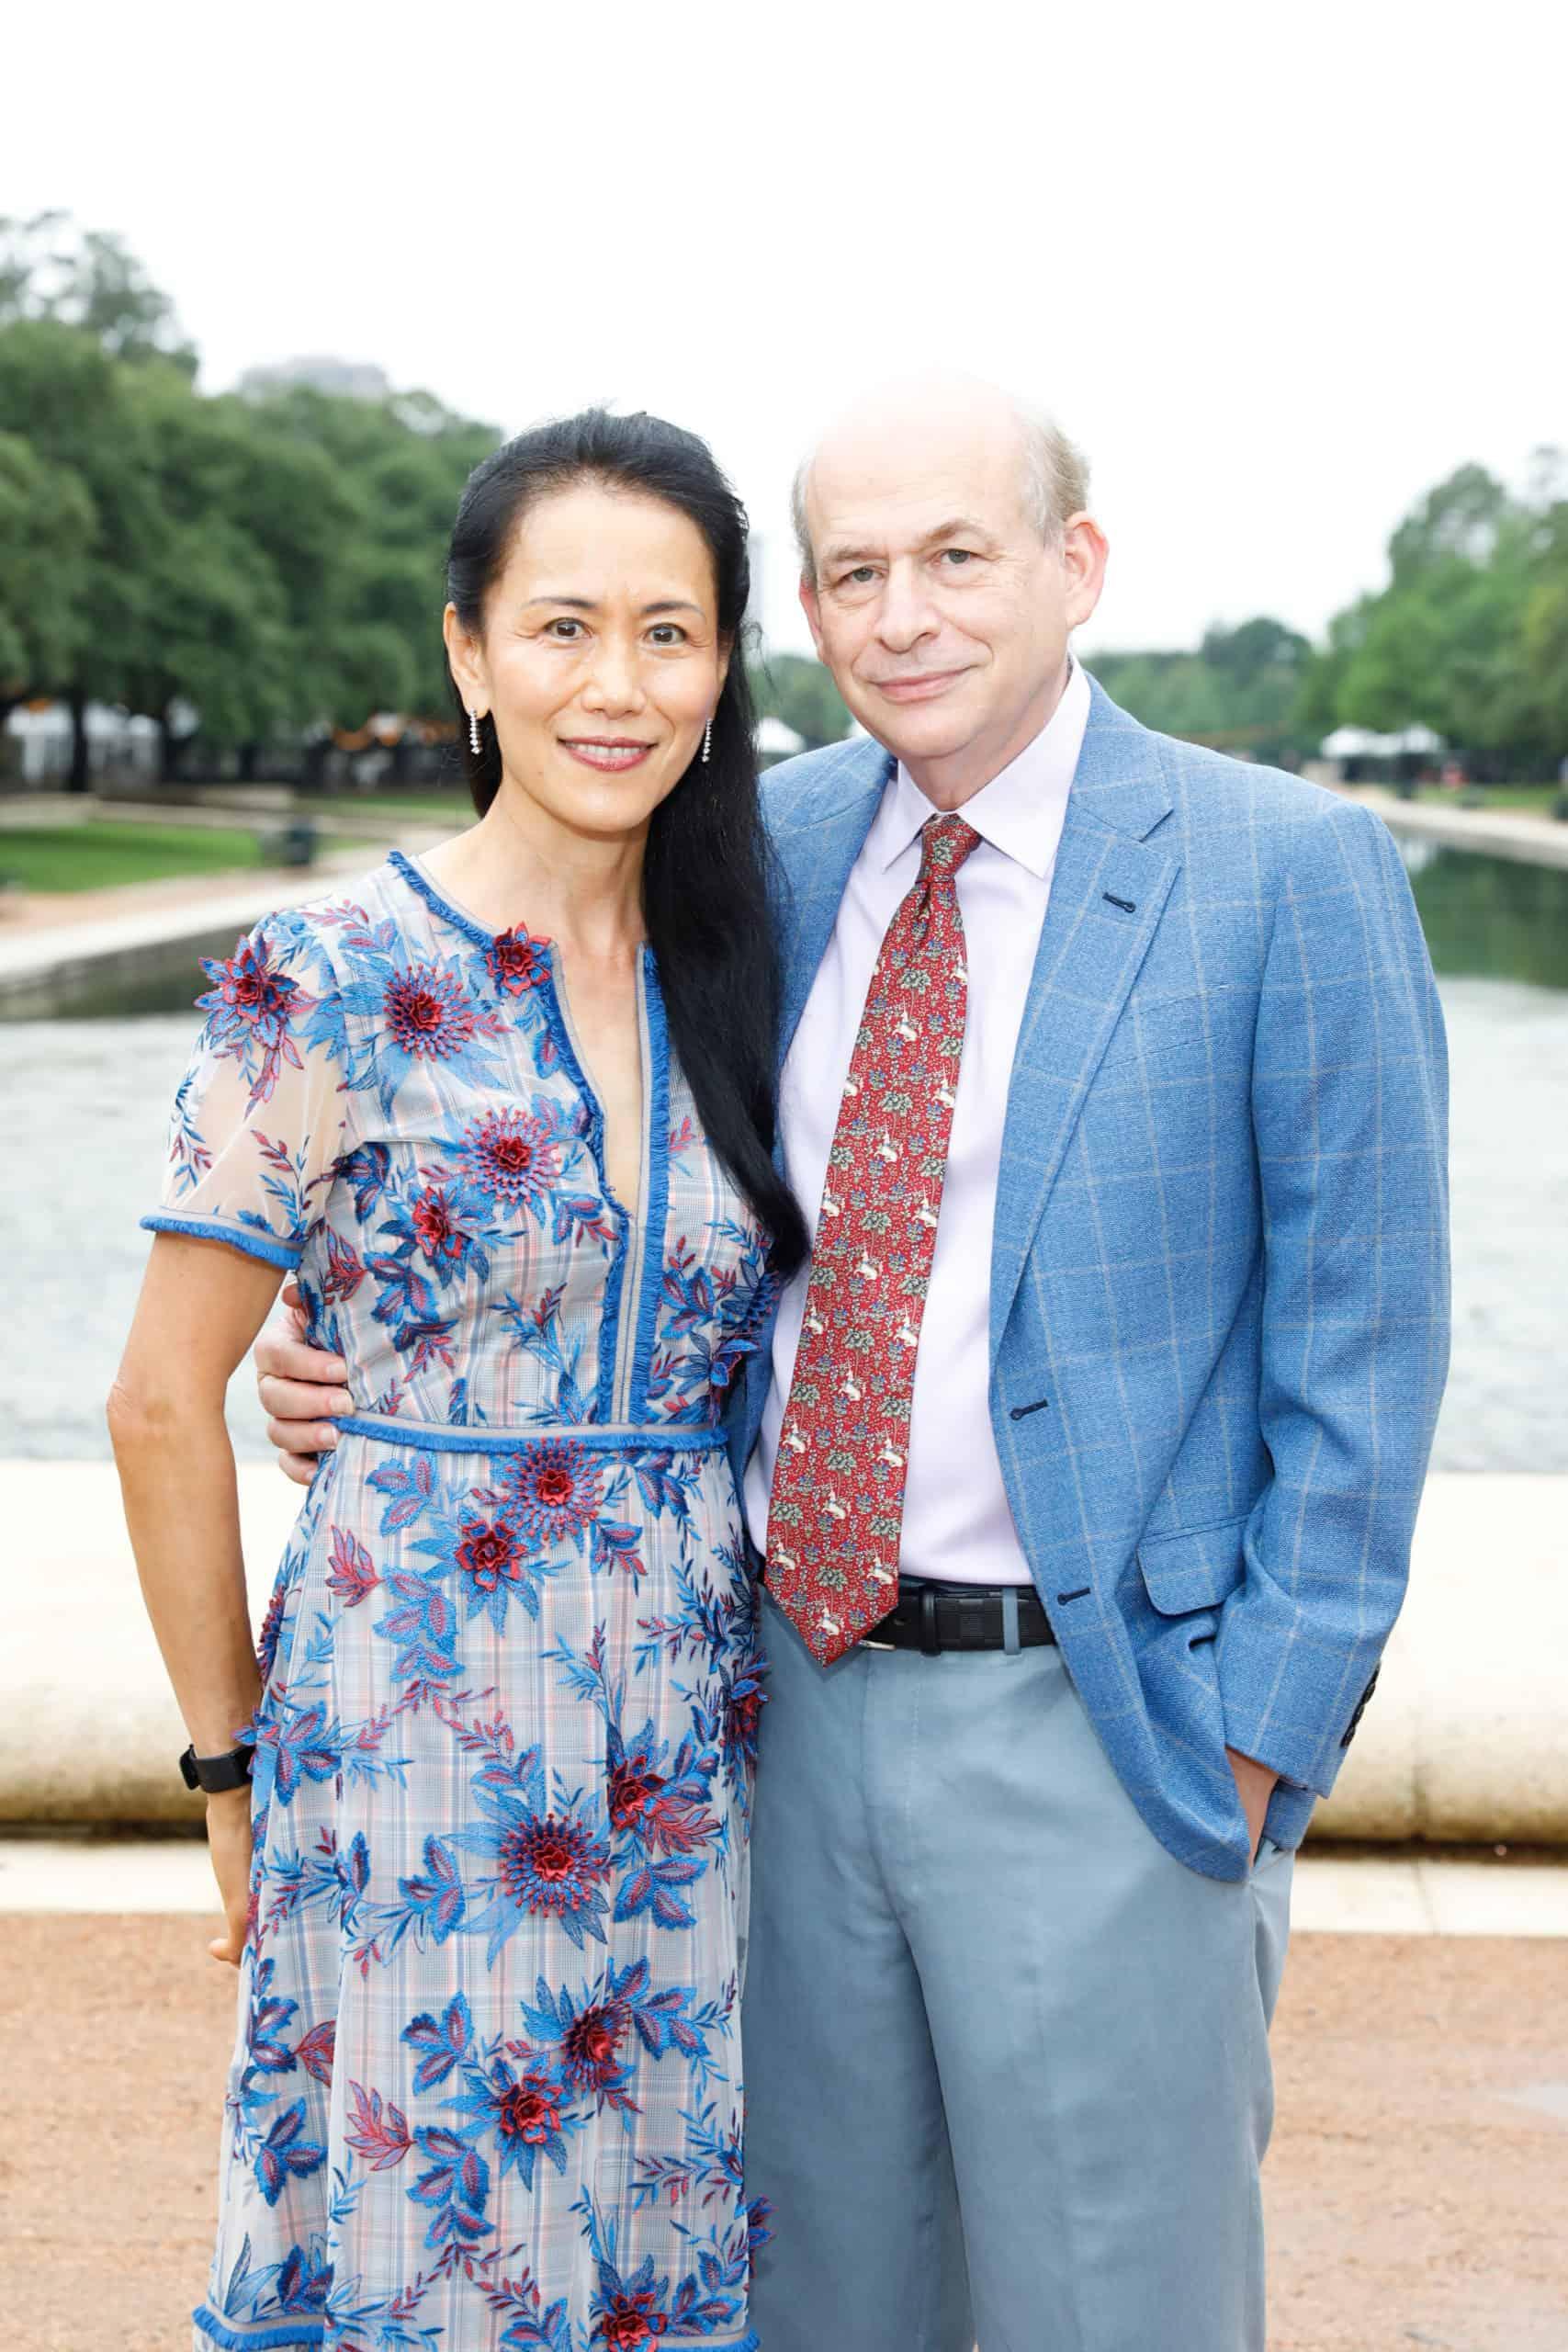 Y. Ping Sun and David Leebron